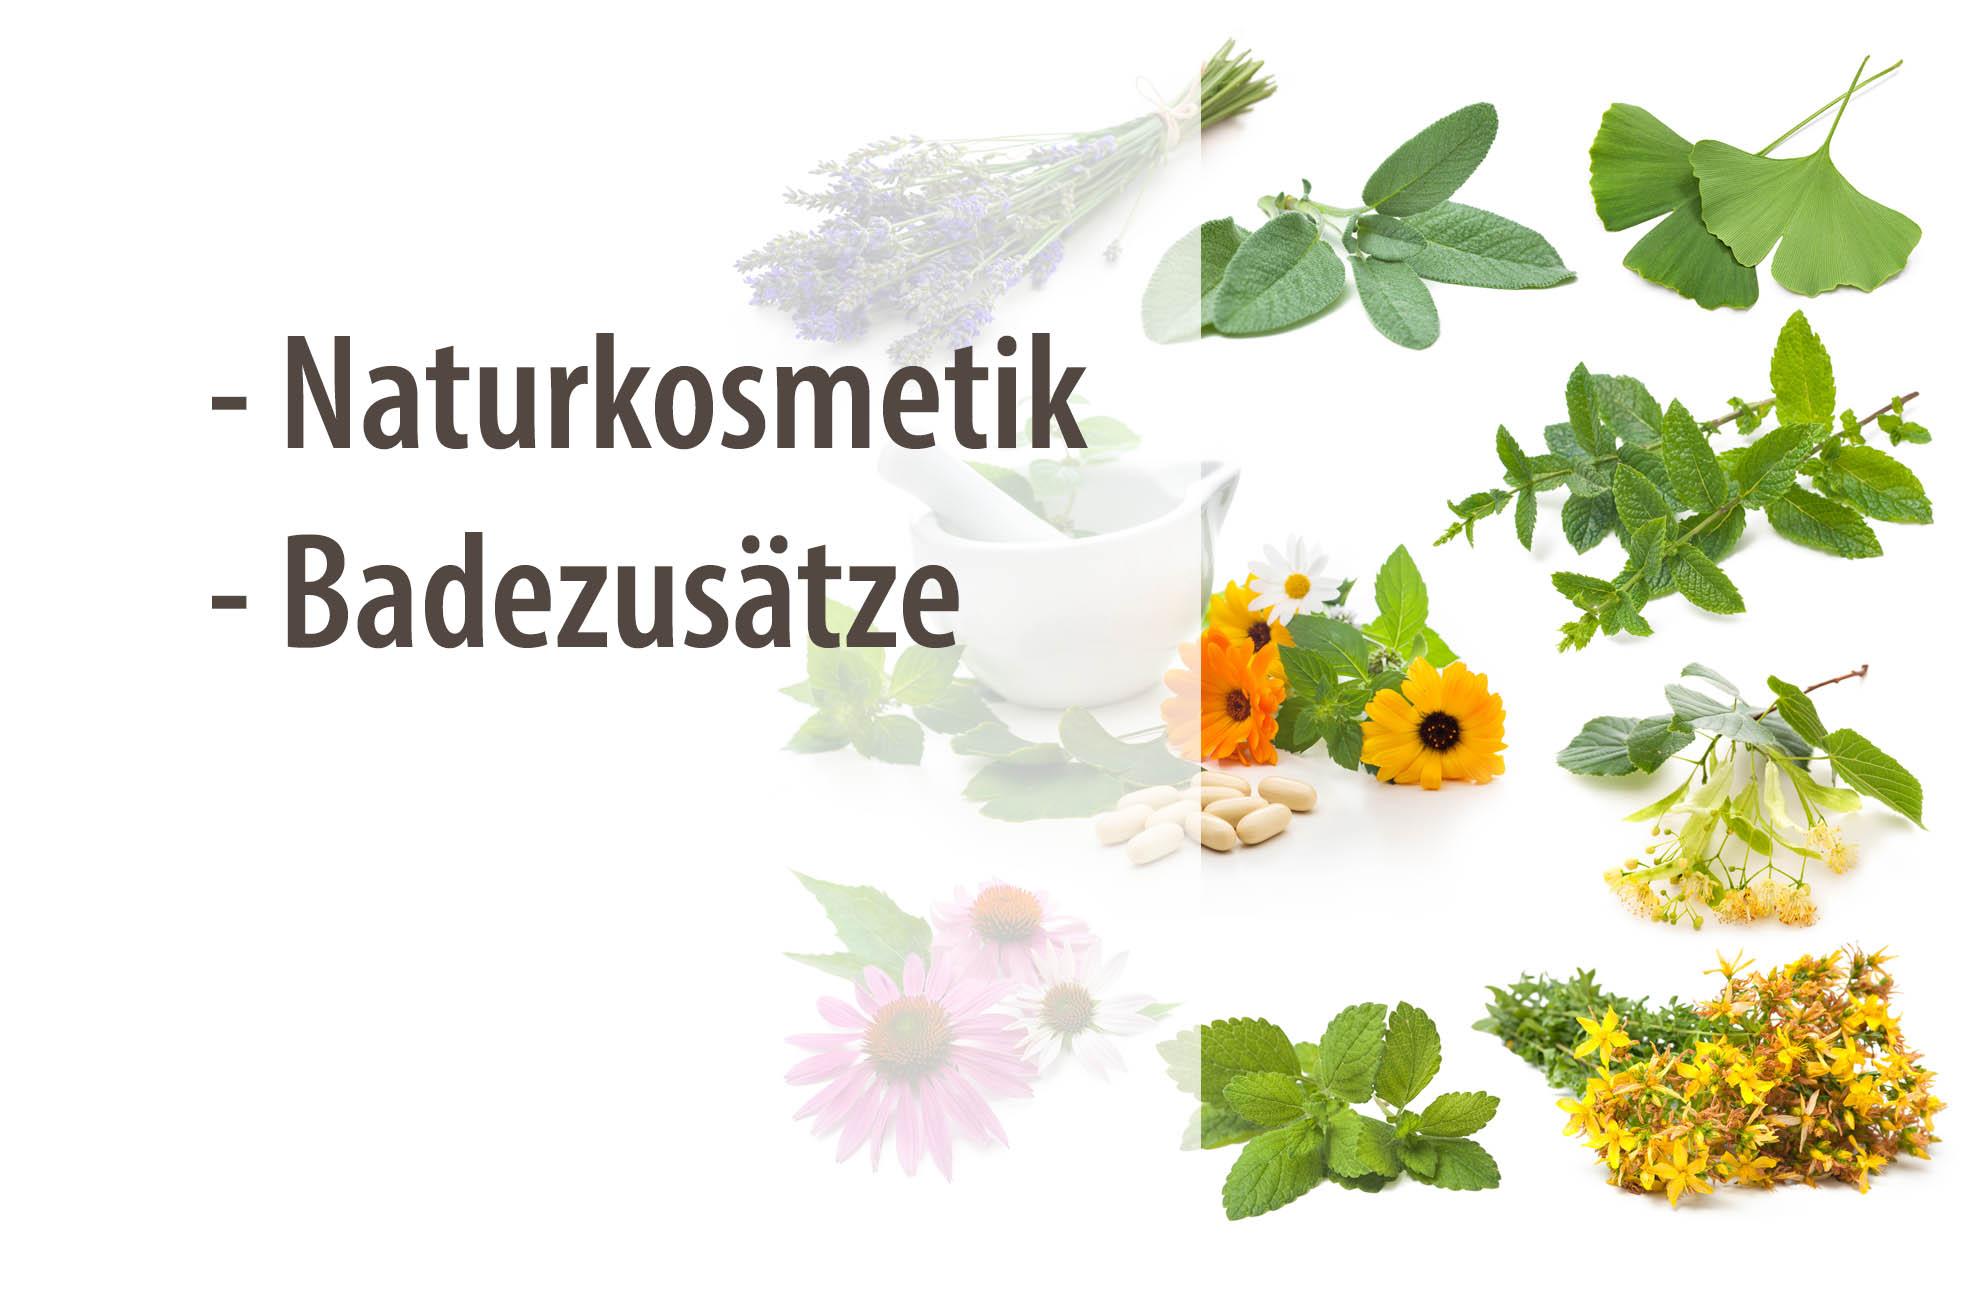 Naturkosmetik_2.jpg